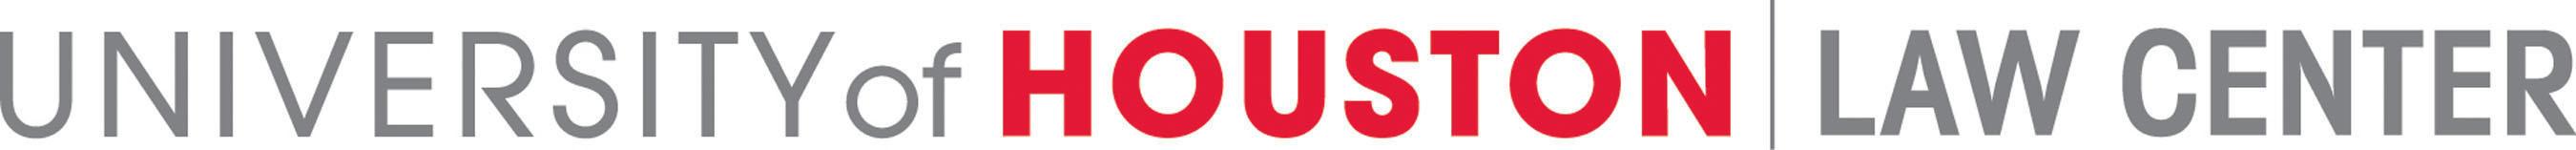 University of Houston Law Center Logo.